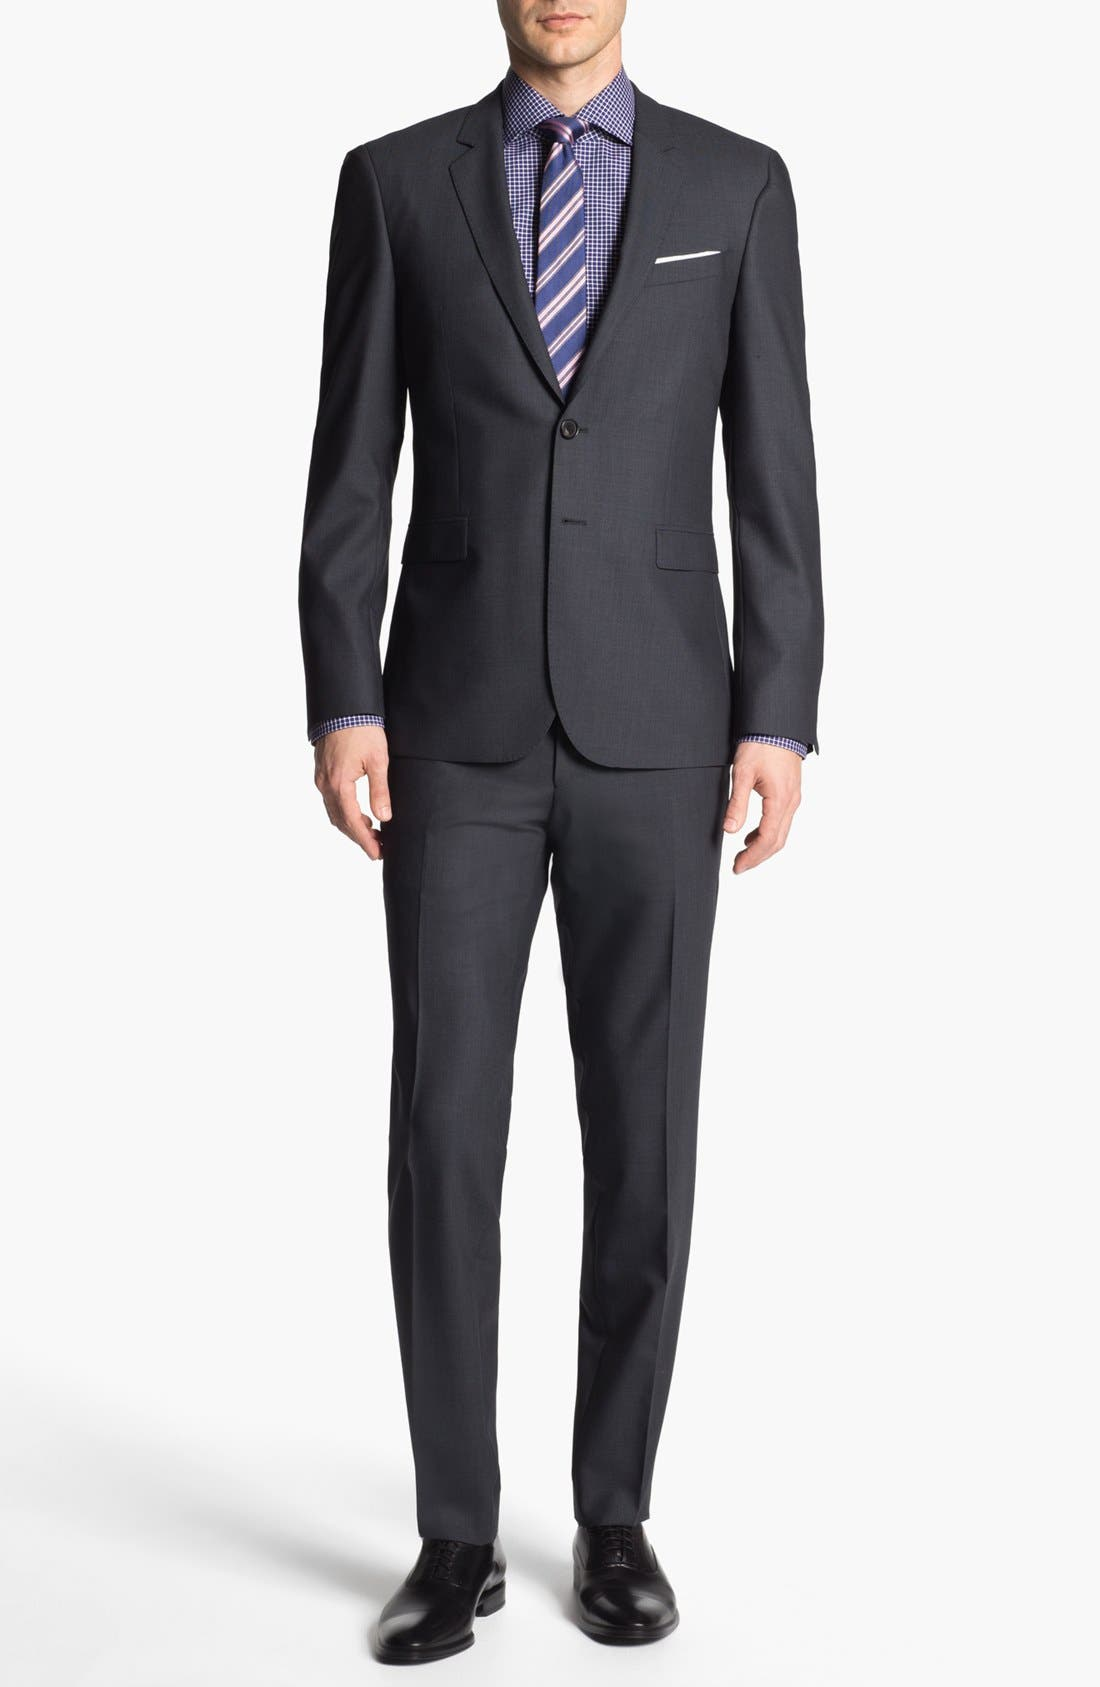 Main Image - BOSS HUGO BOSS 'Ryan/Win' Extra Trim Fit Suit